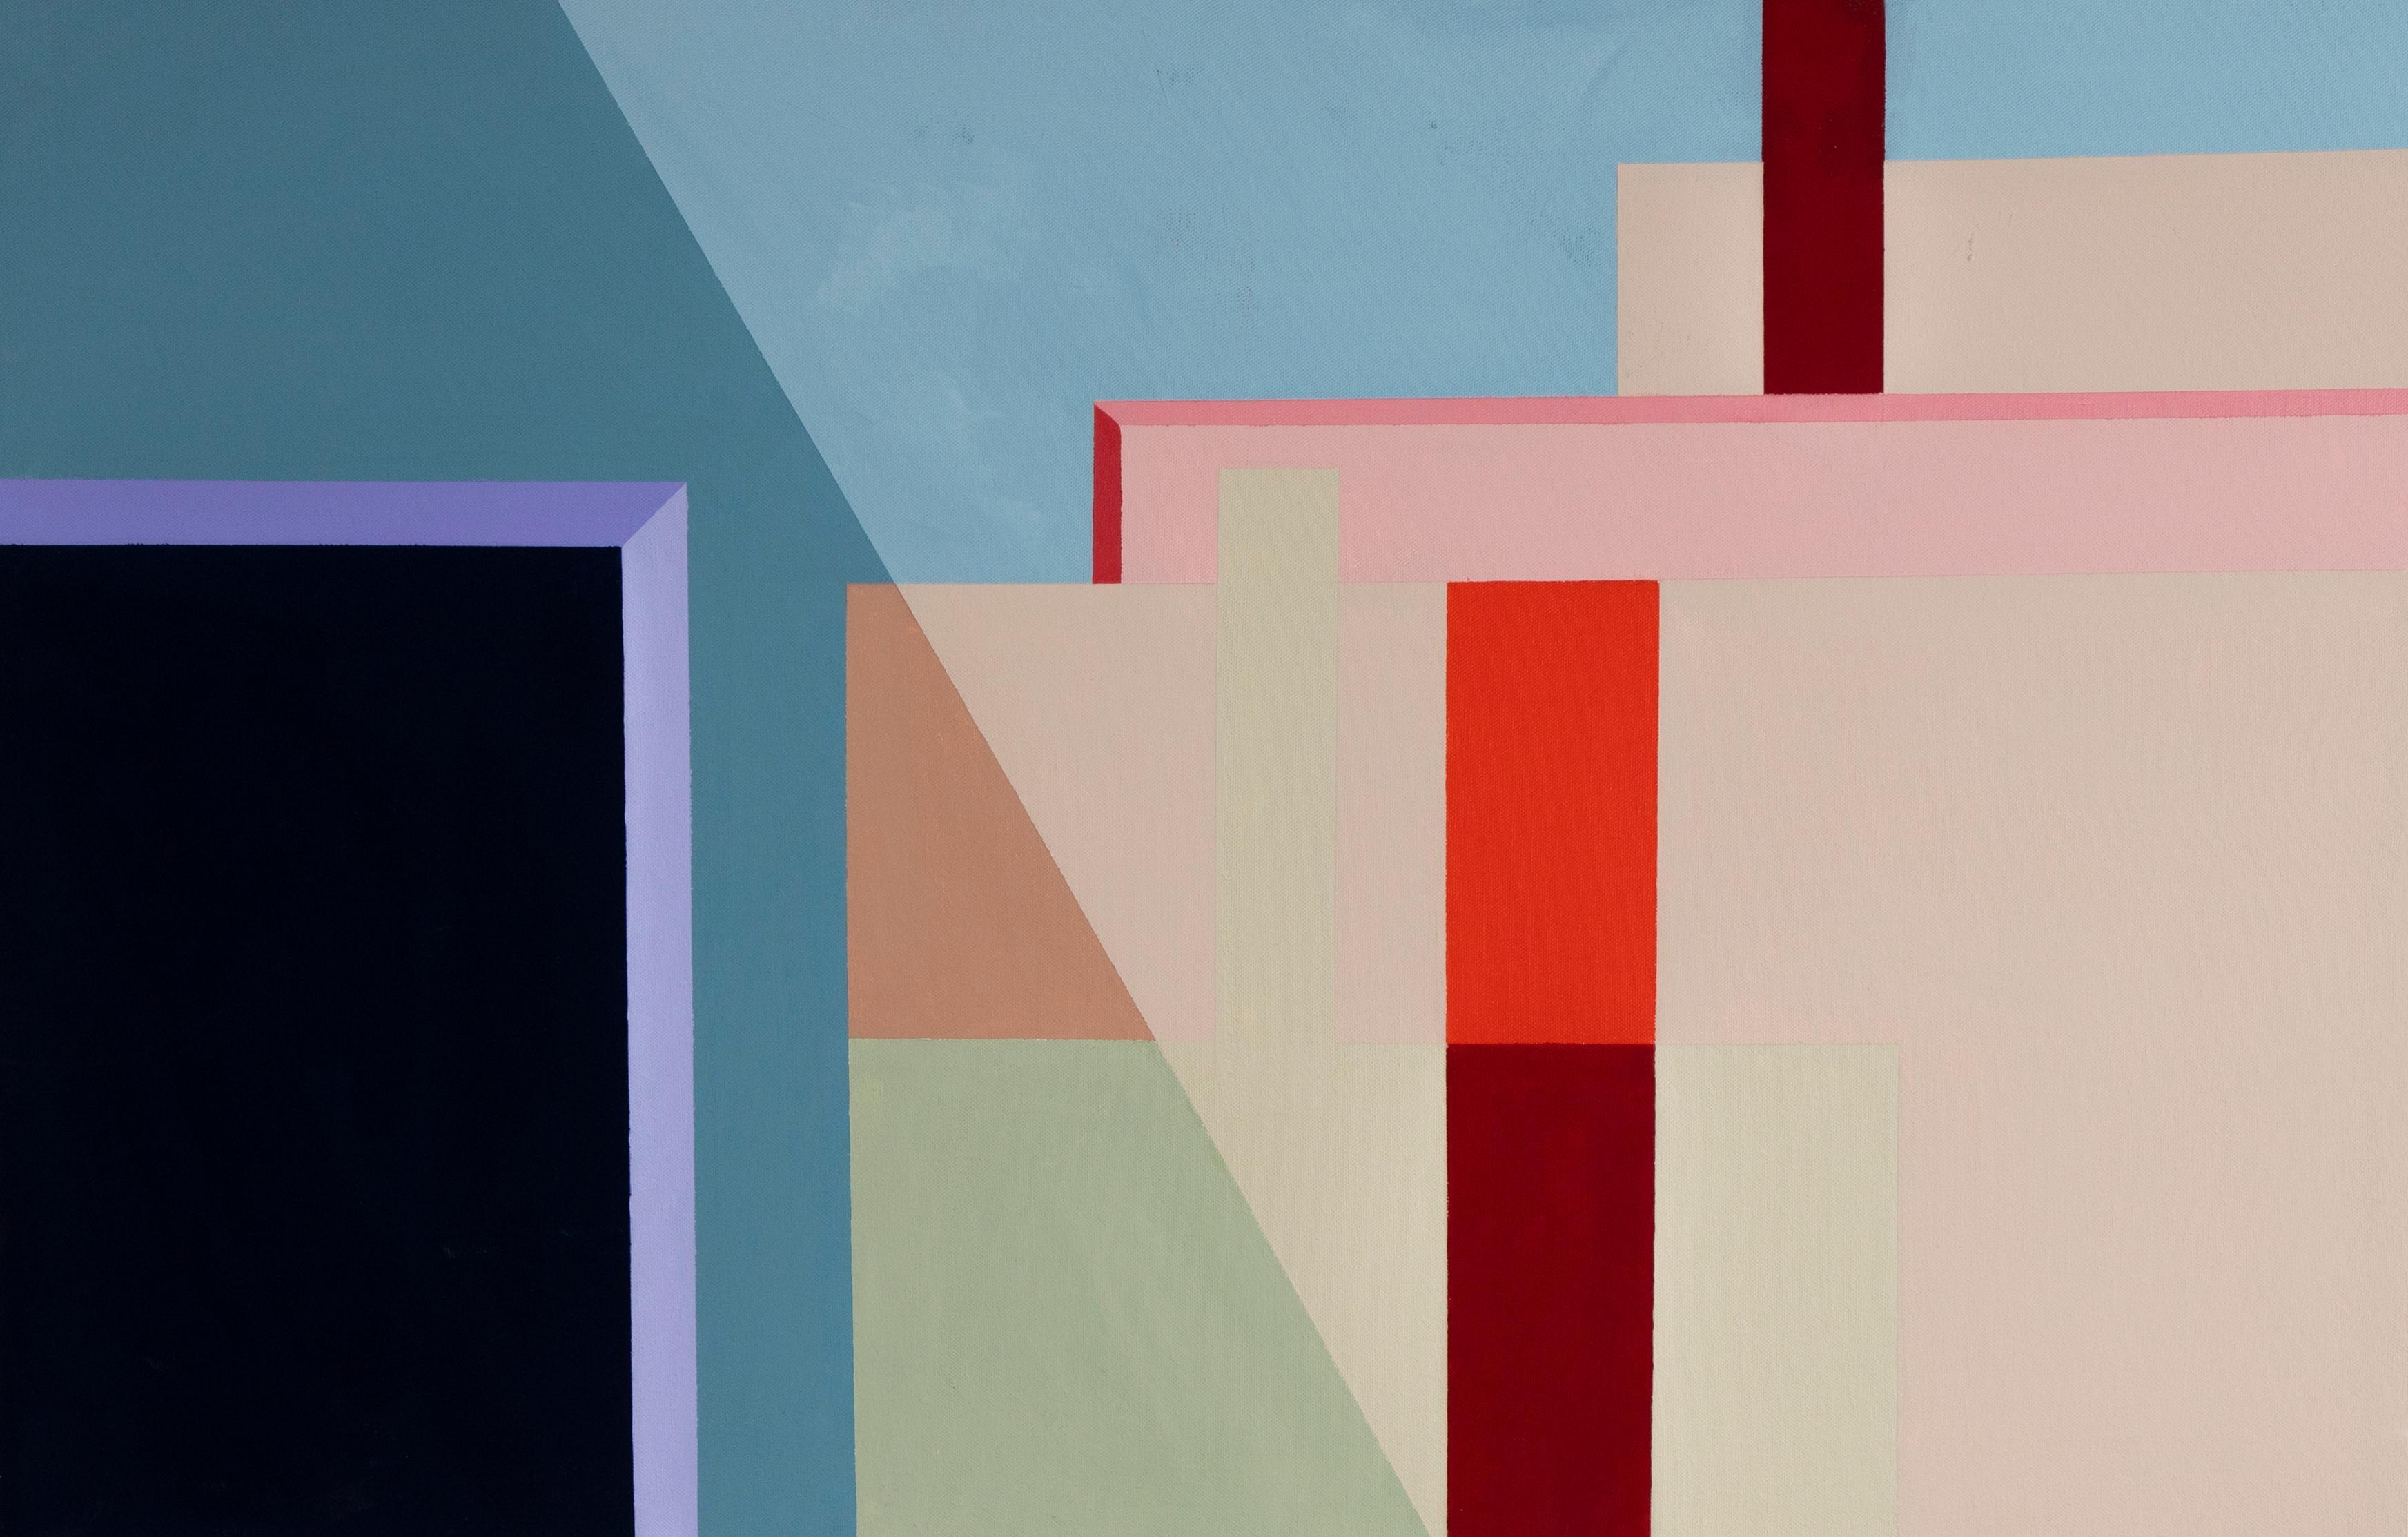 baby yoda study, Acrylic on canvas, 90cm x 60cm, 2021